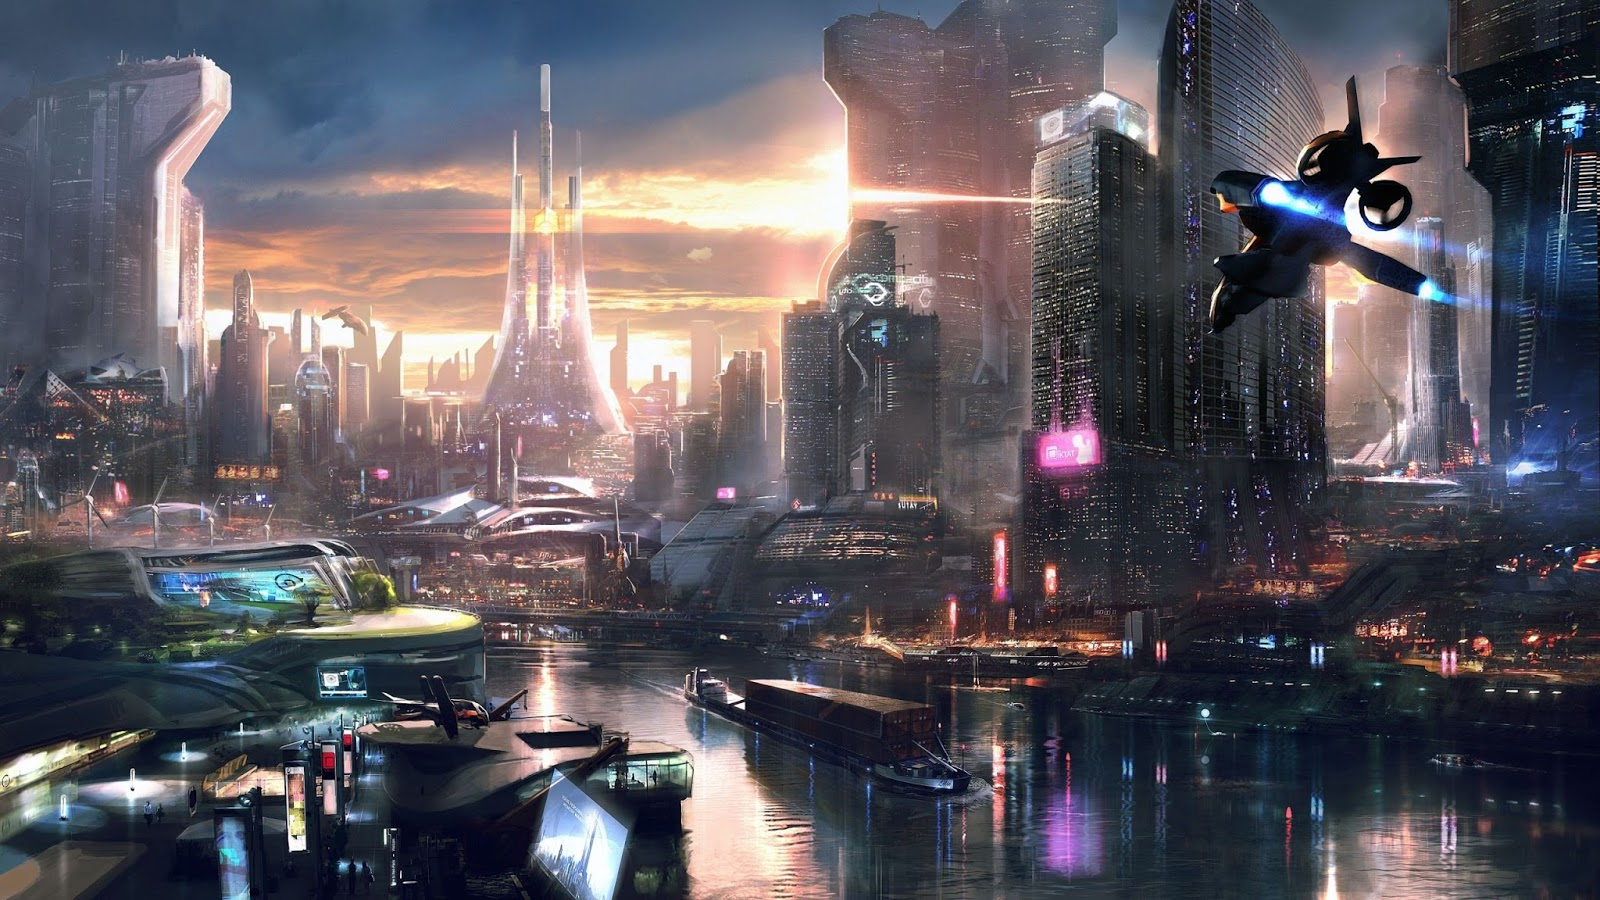 Beautiful Remember Me Science Fiction Cityscape Wallpaper